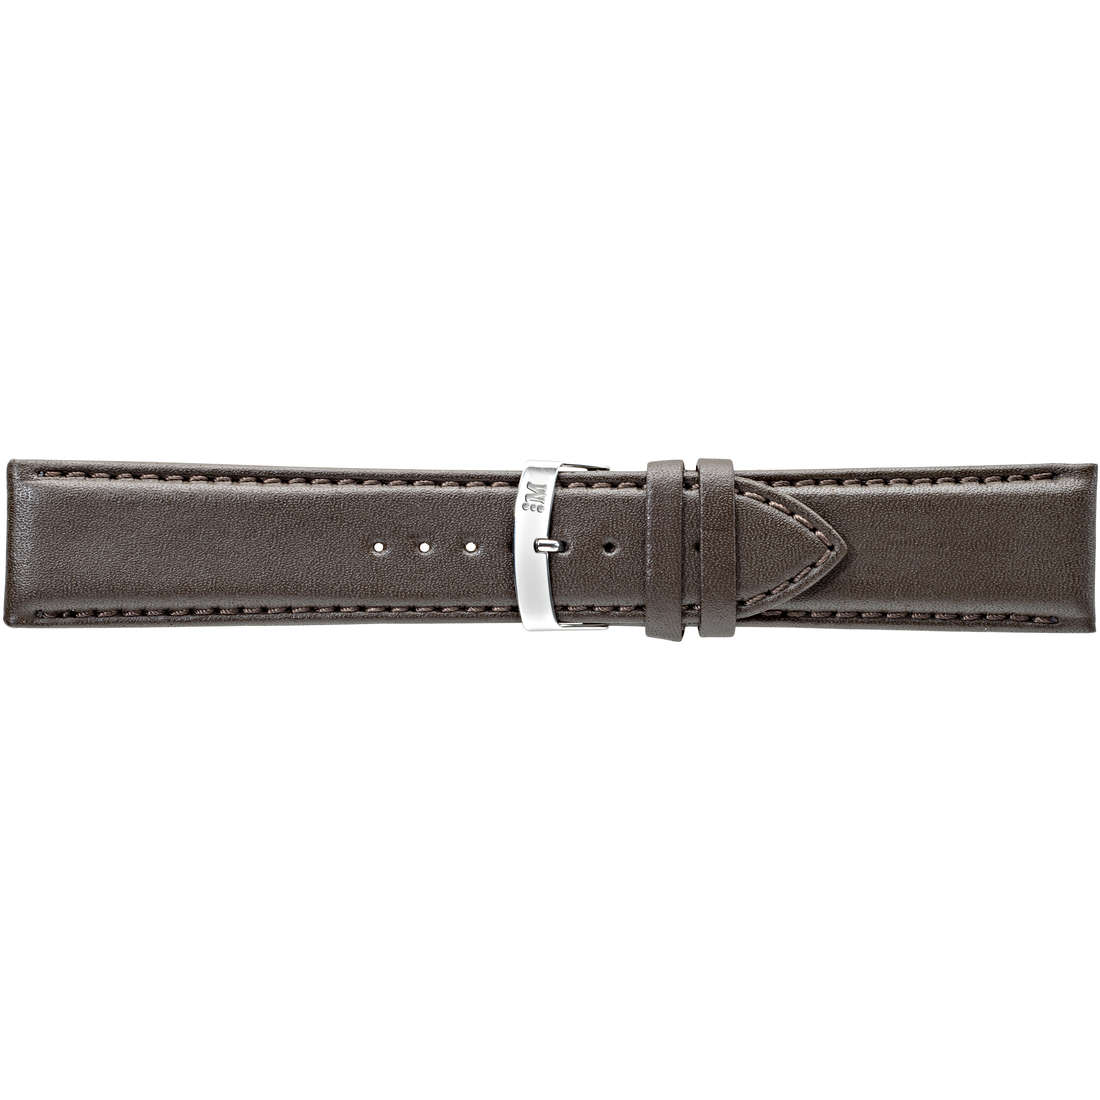 watch watch bands watch straps man Morellato Morellato 1930 A01X3395875032CR26